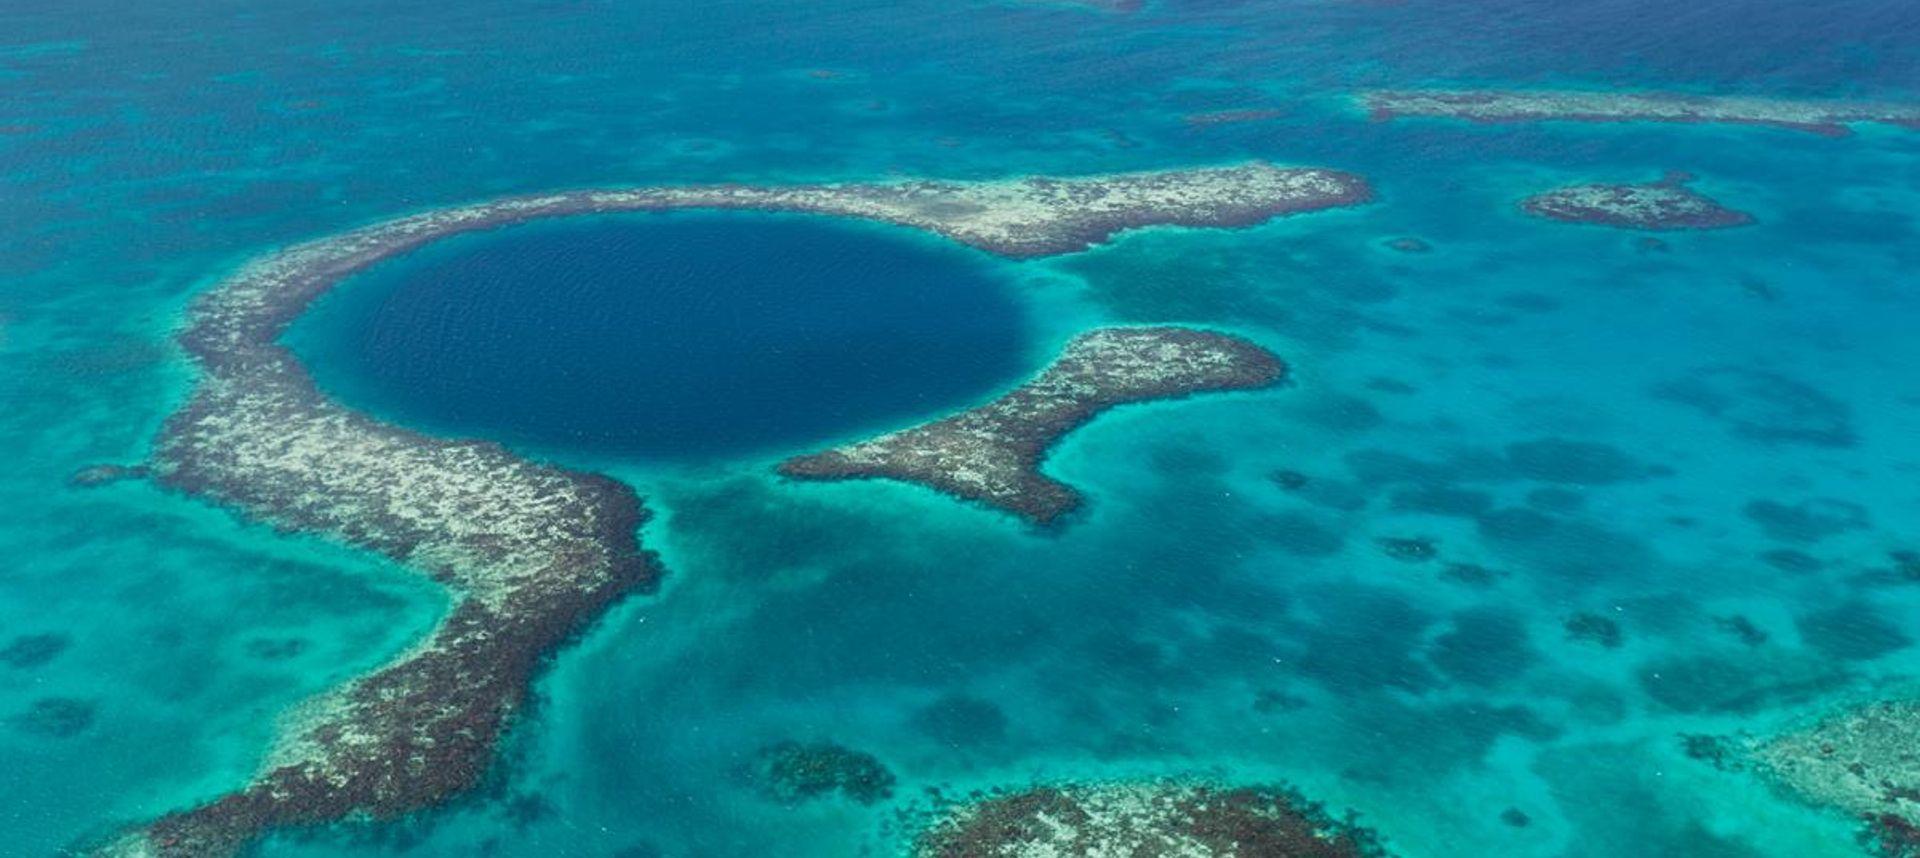 Jaguar in Belize (Demian Solano Photography)